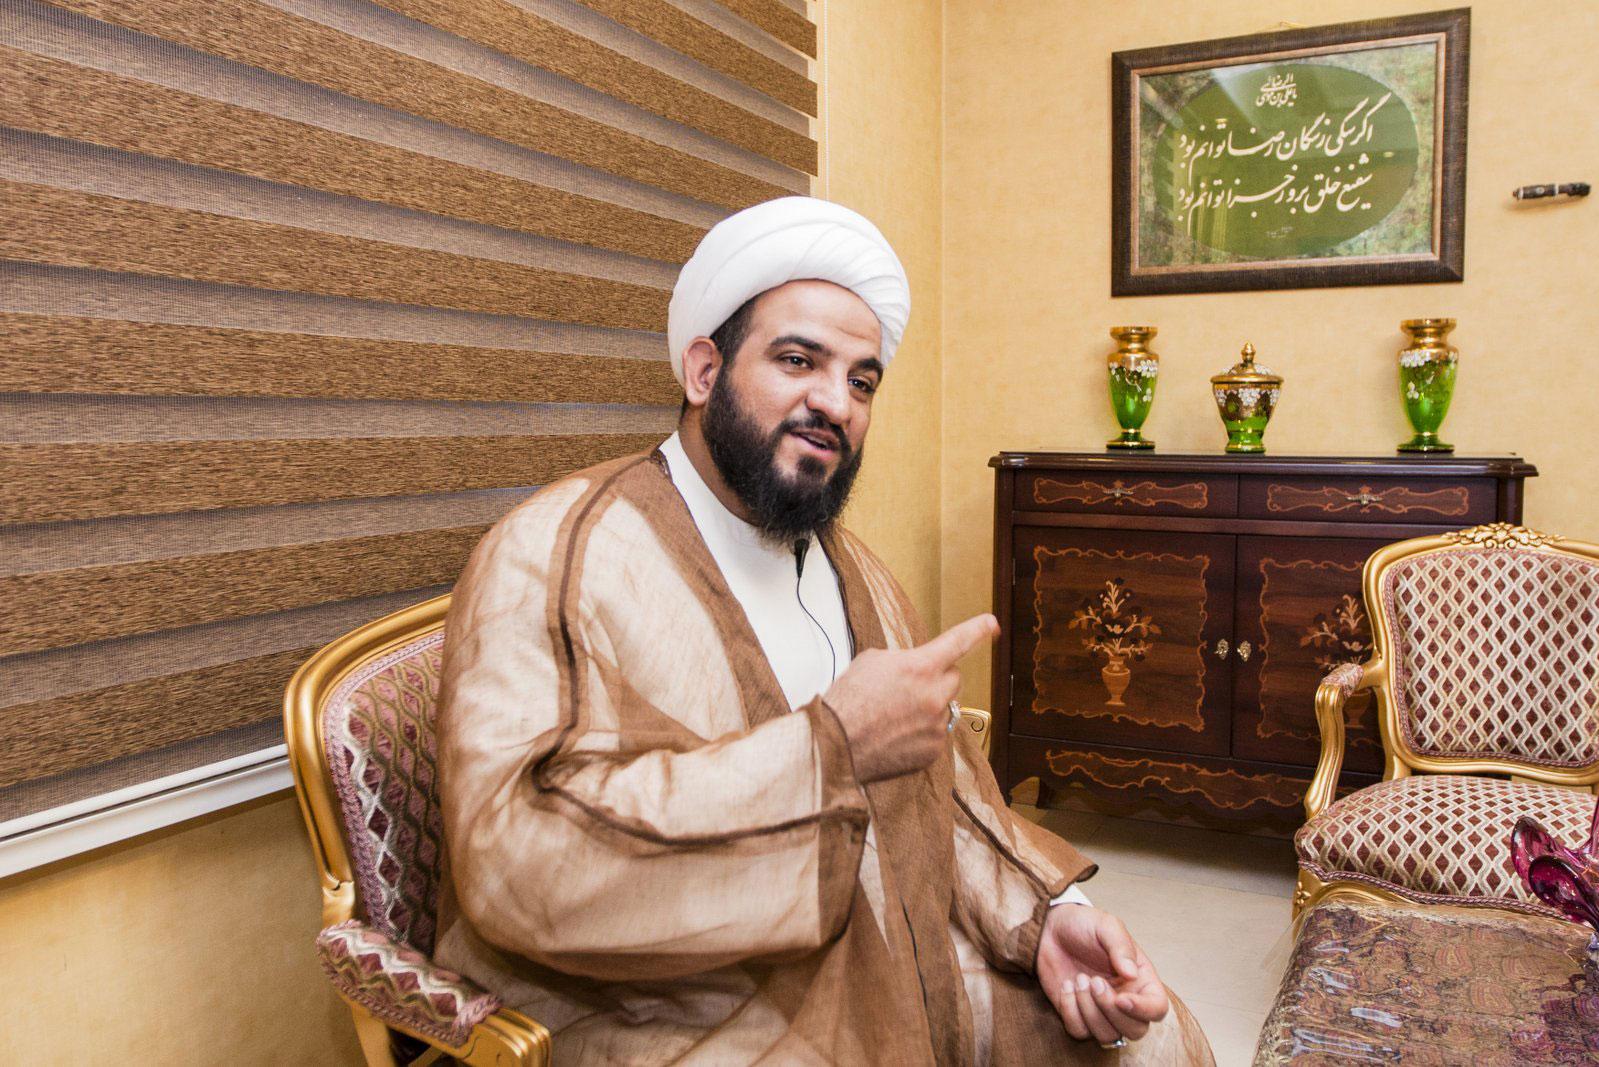 13981228000259 Test NewPhotoFree - تولیت امامزاده صالح (ع) بعد از ۱۰ سال تغییر کرد